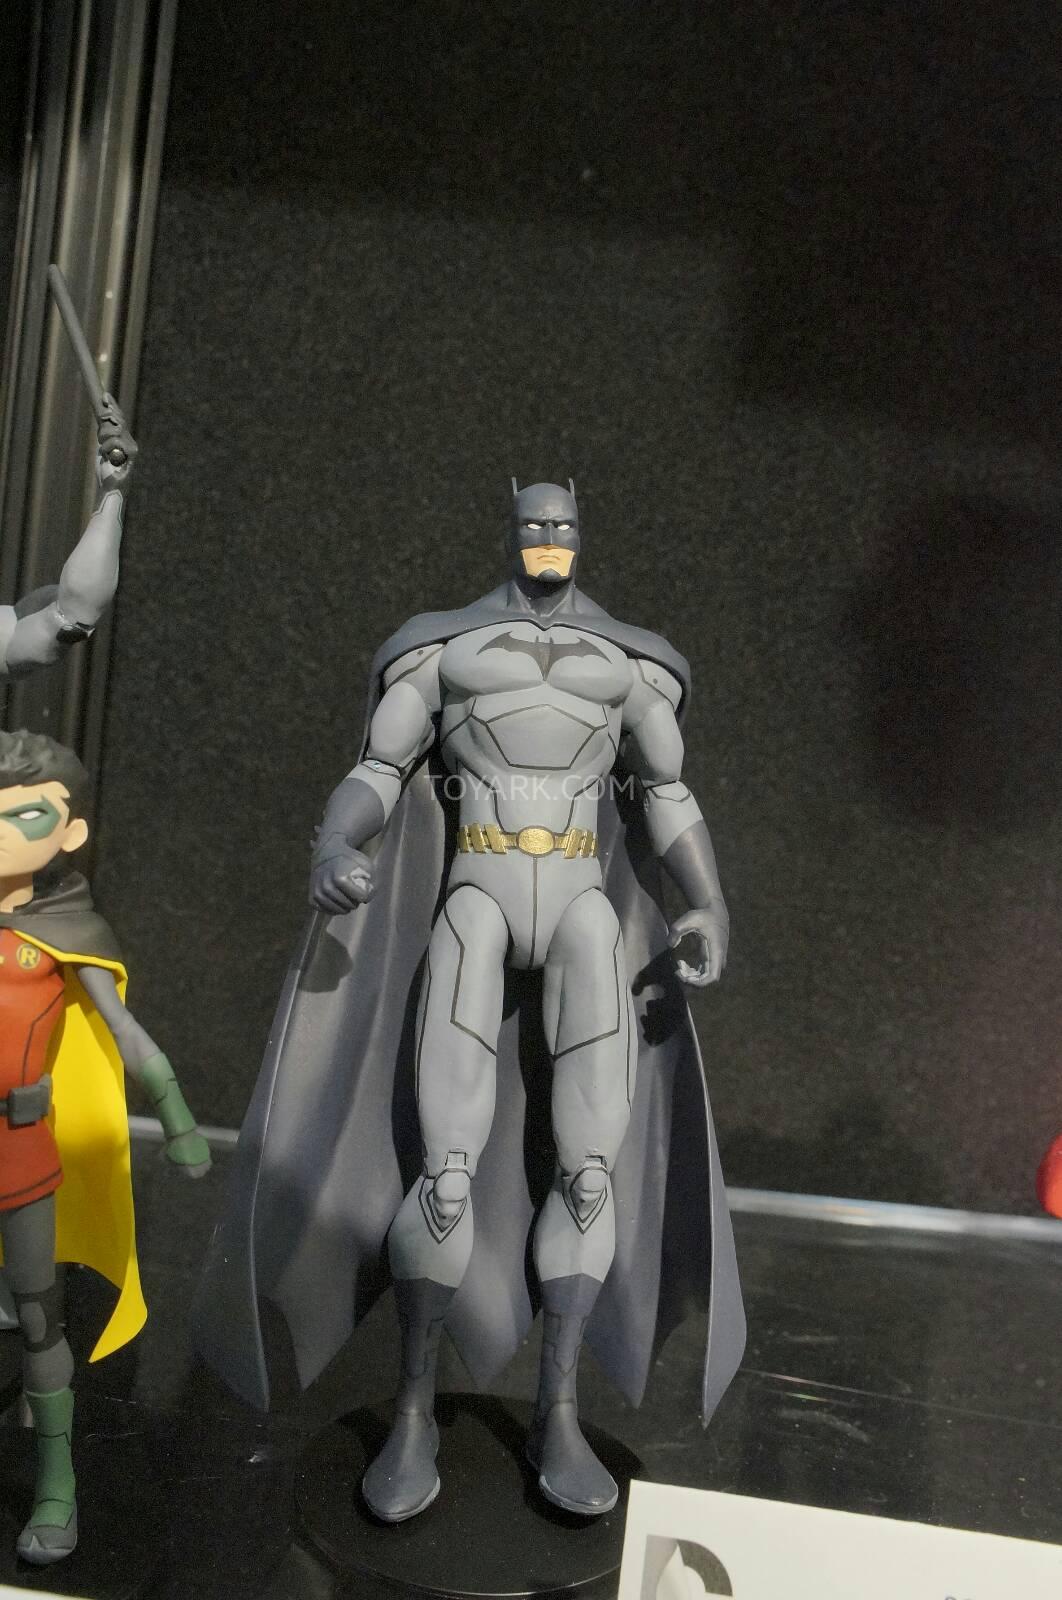 [Toy Fair 2014] DC Collectibles Toy-Fair-2014-DC-Collectibles-108